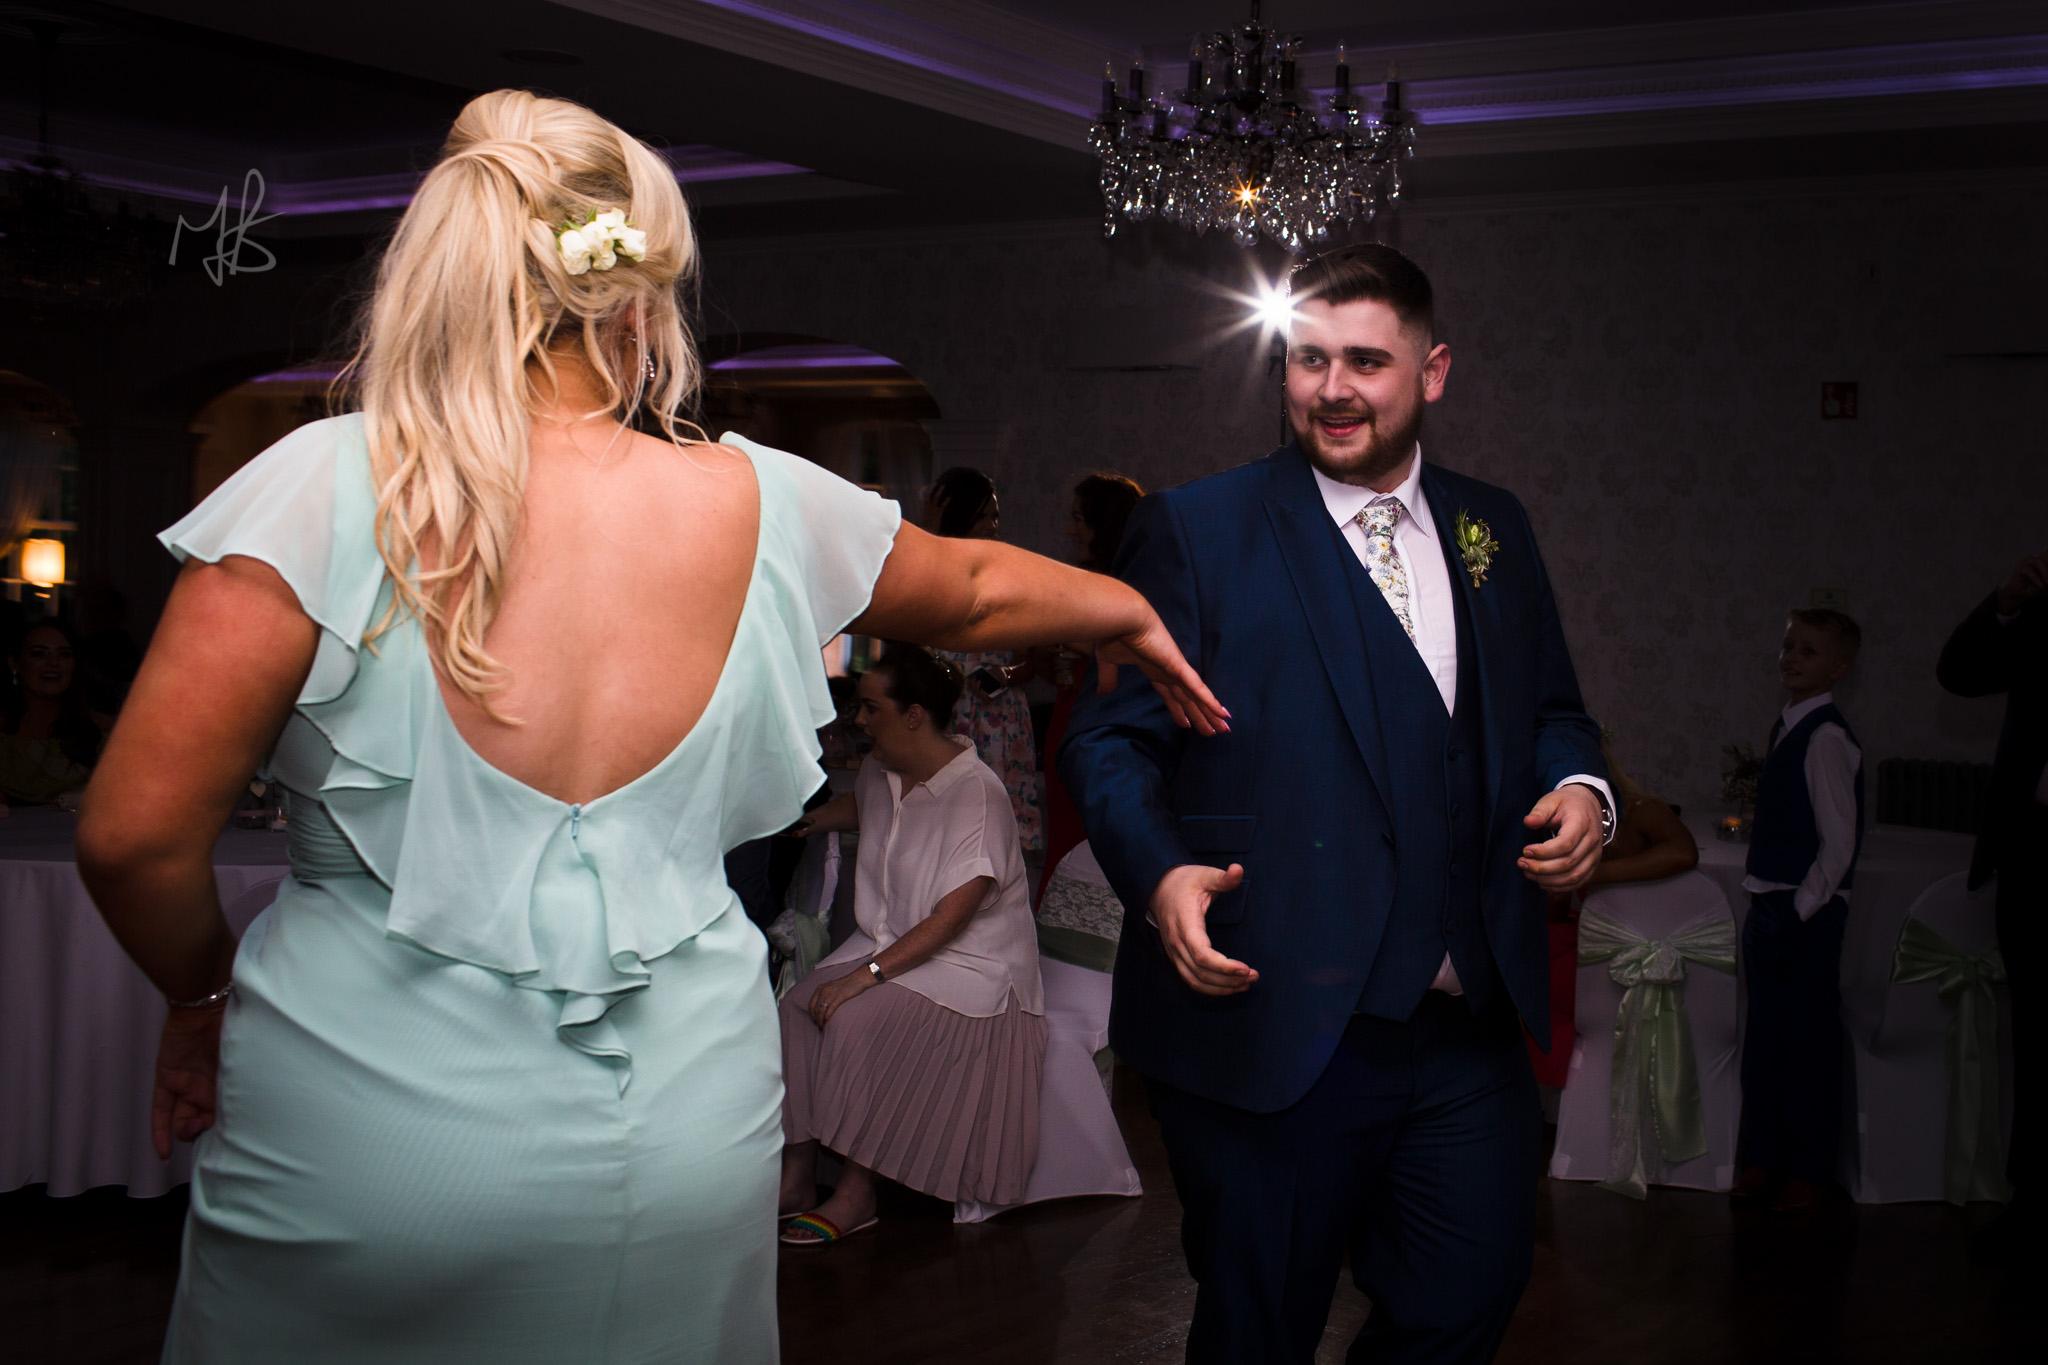 Northern-Ireland-Wedding-Photographer-Mark-Barnes-Ballymena_wedding-photography-Leighinmohr-House-Seamas_Alanna_For-web-55.jpg